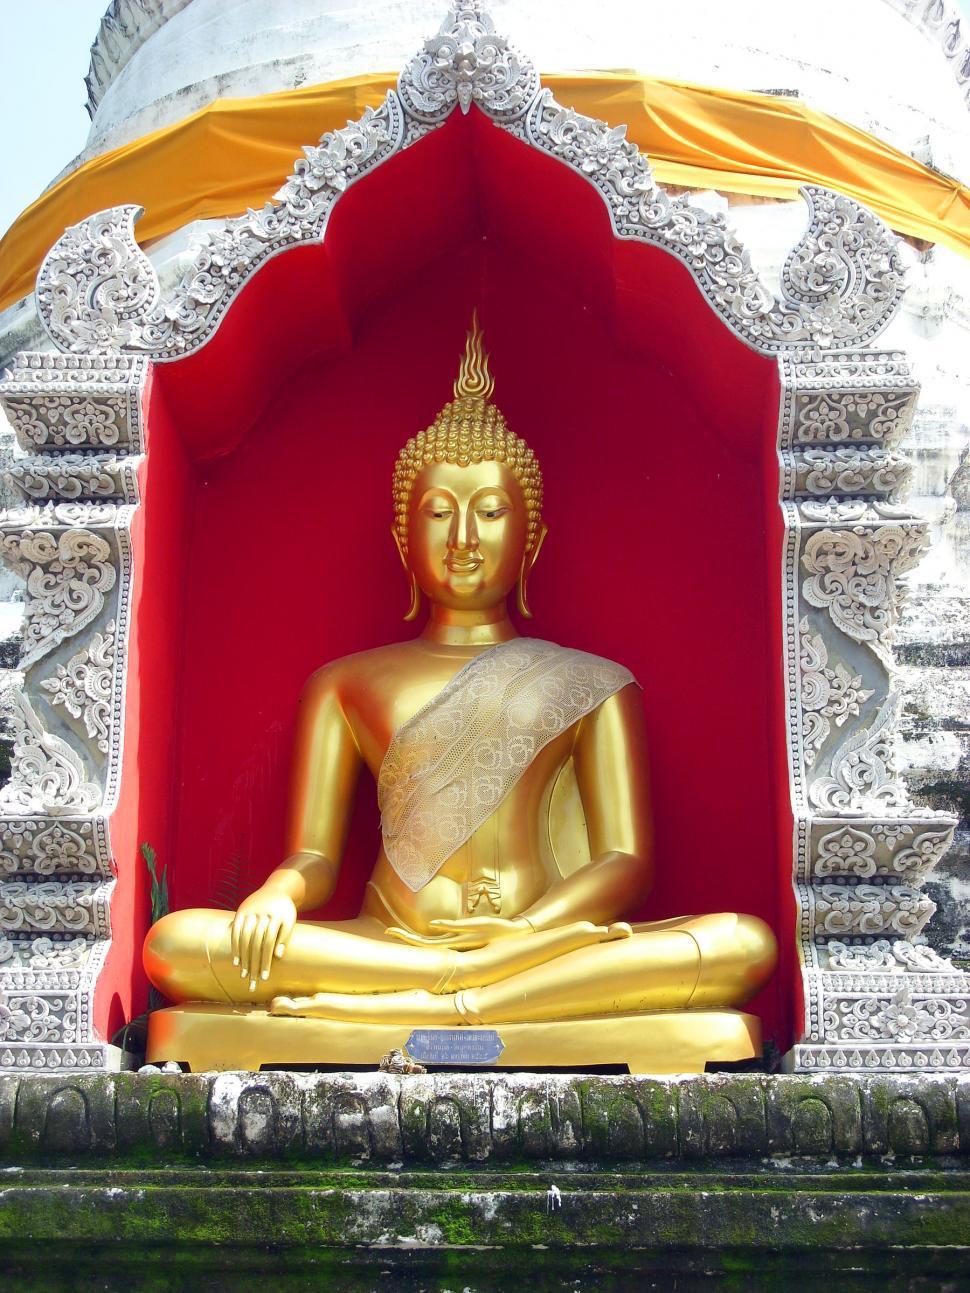 Download Free Stock Photo of Buddha in Pagoda